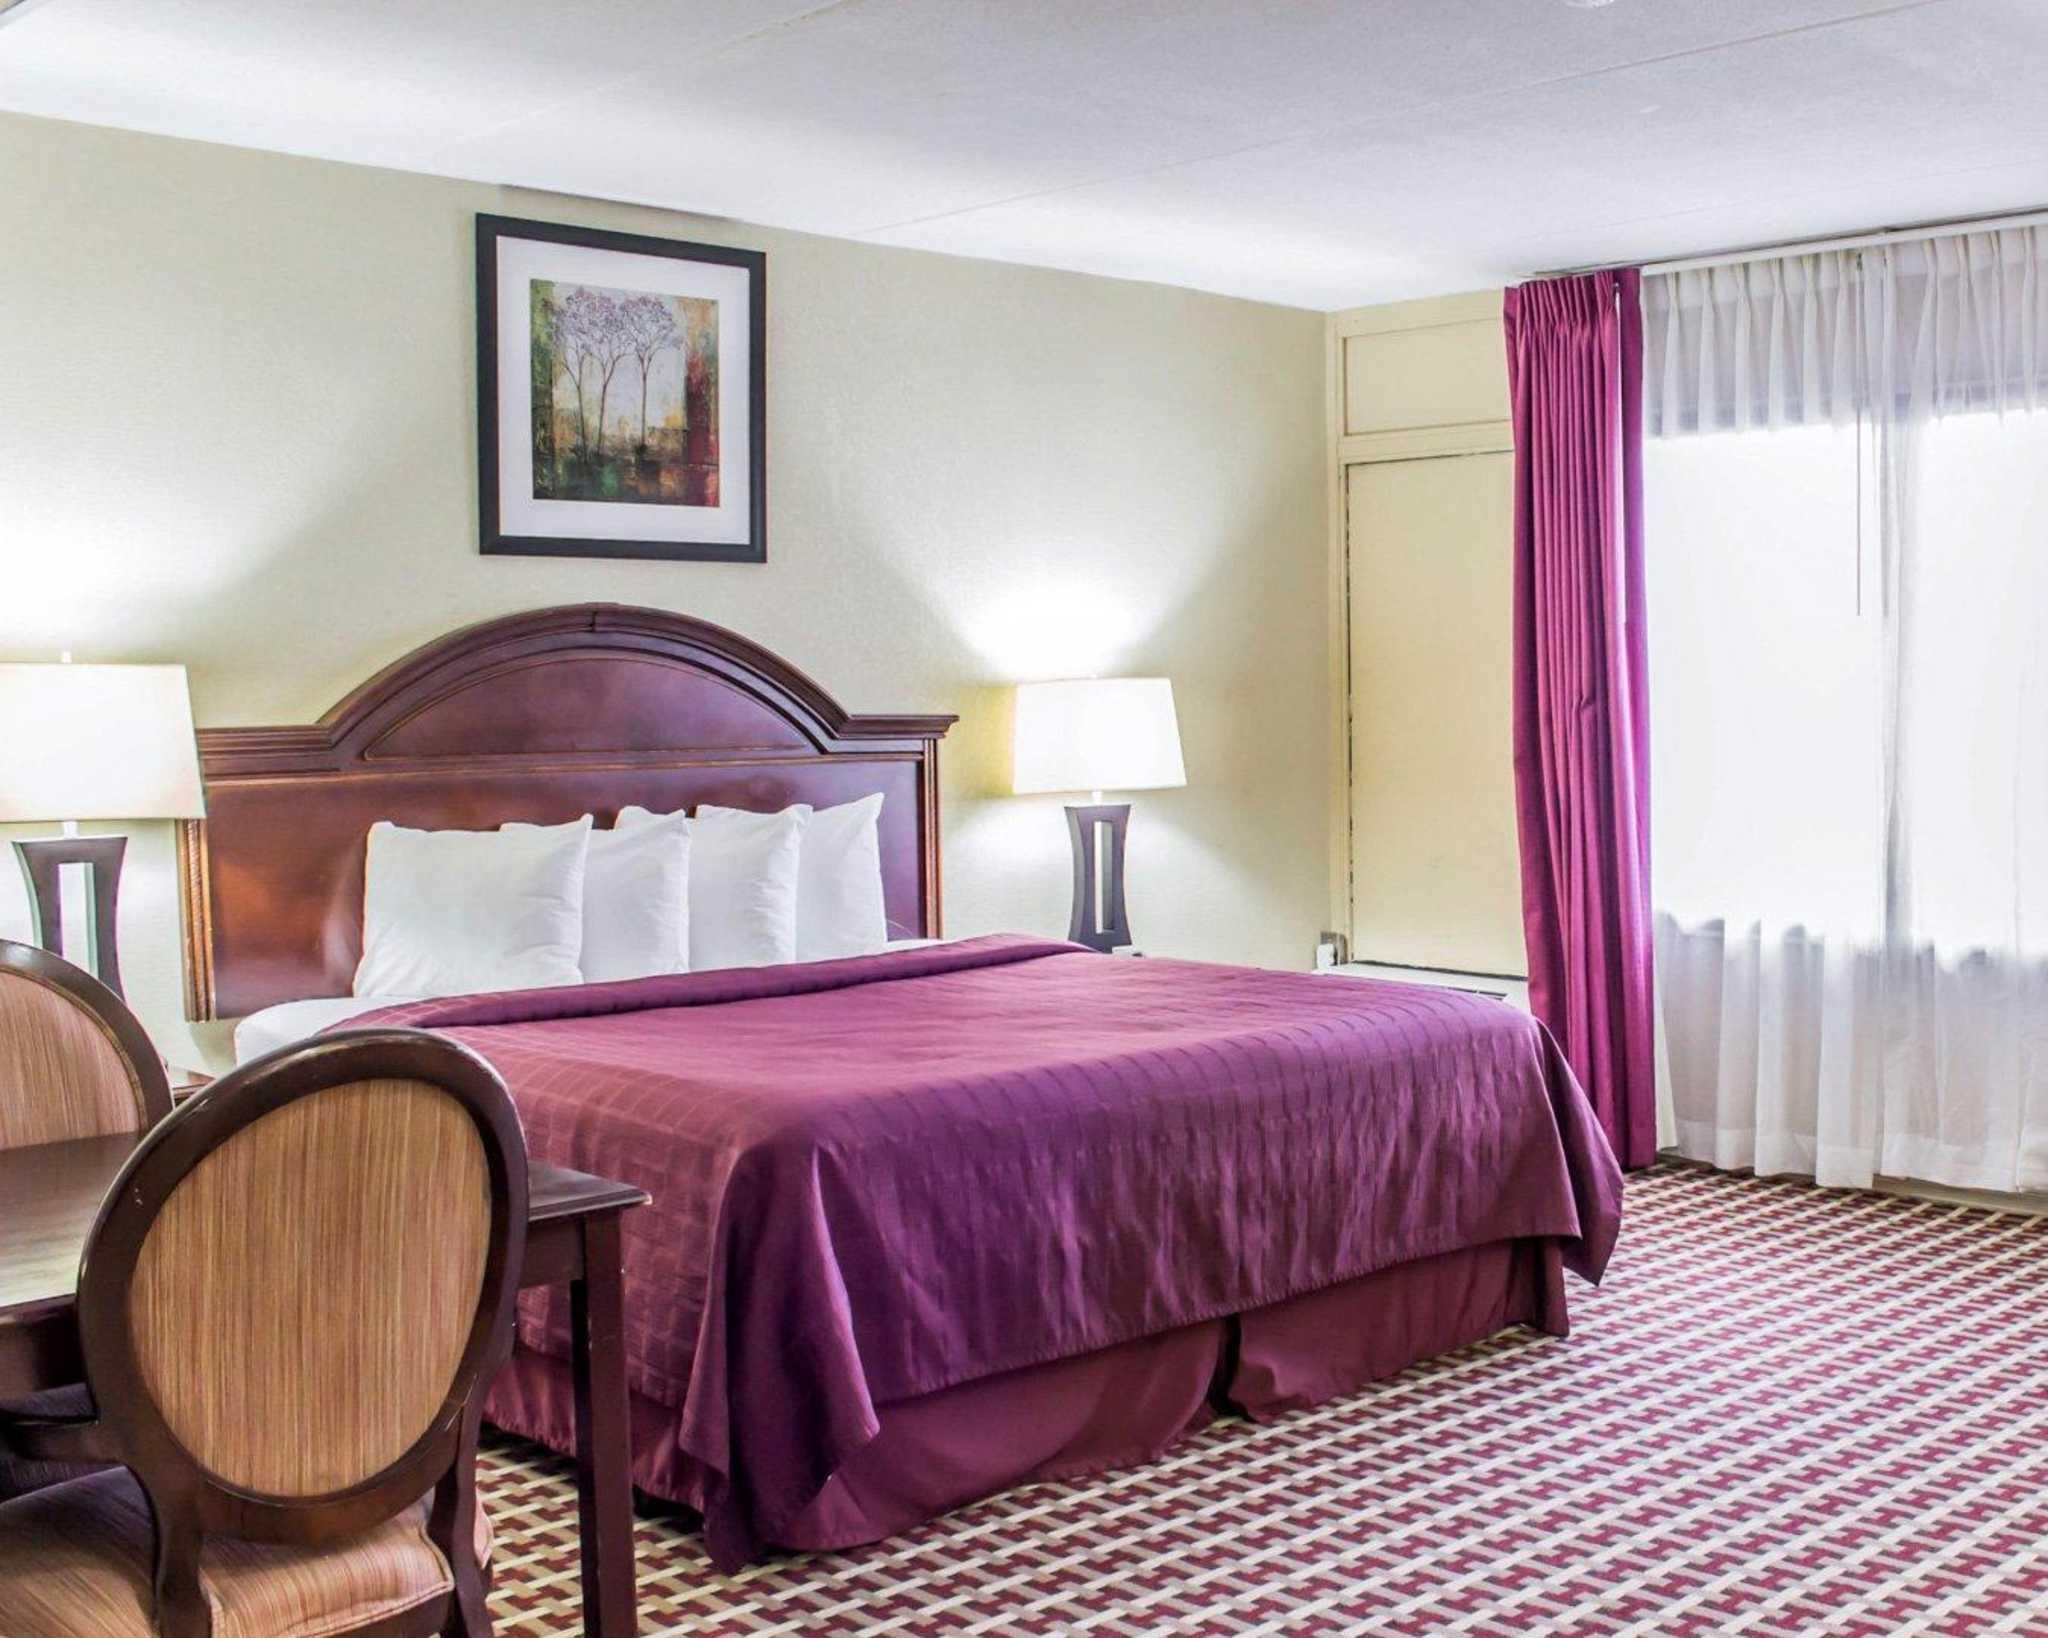 Quality Inn & Suites Fort Bragg image 6